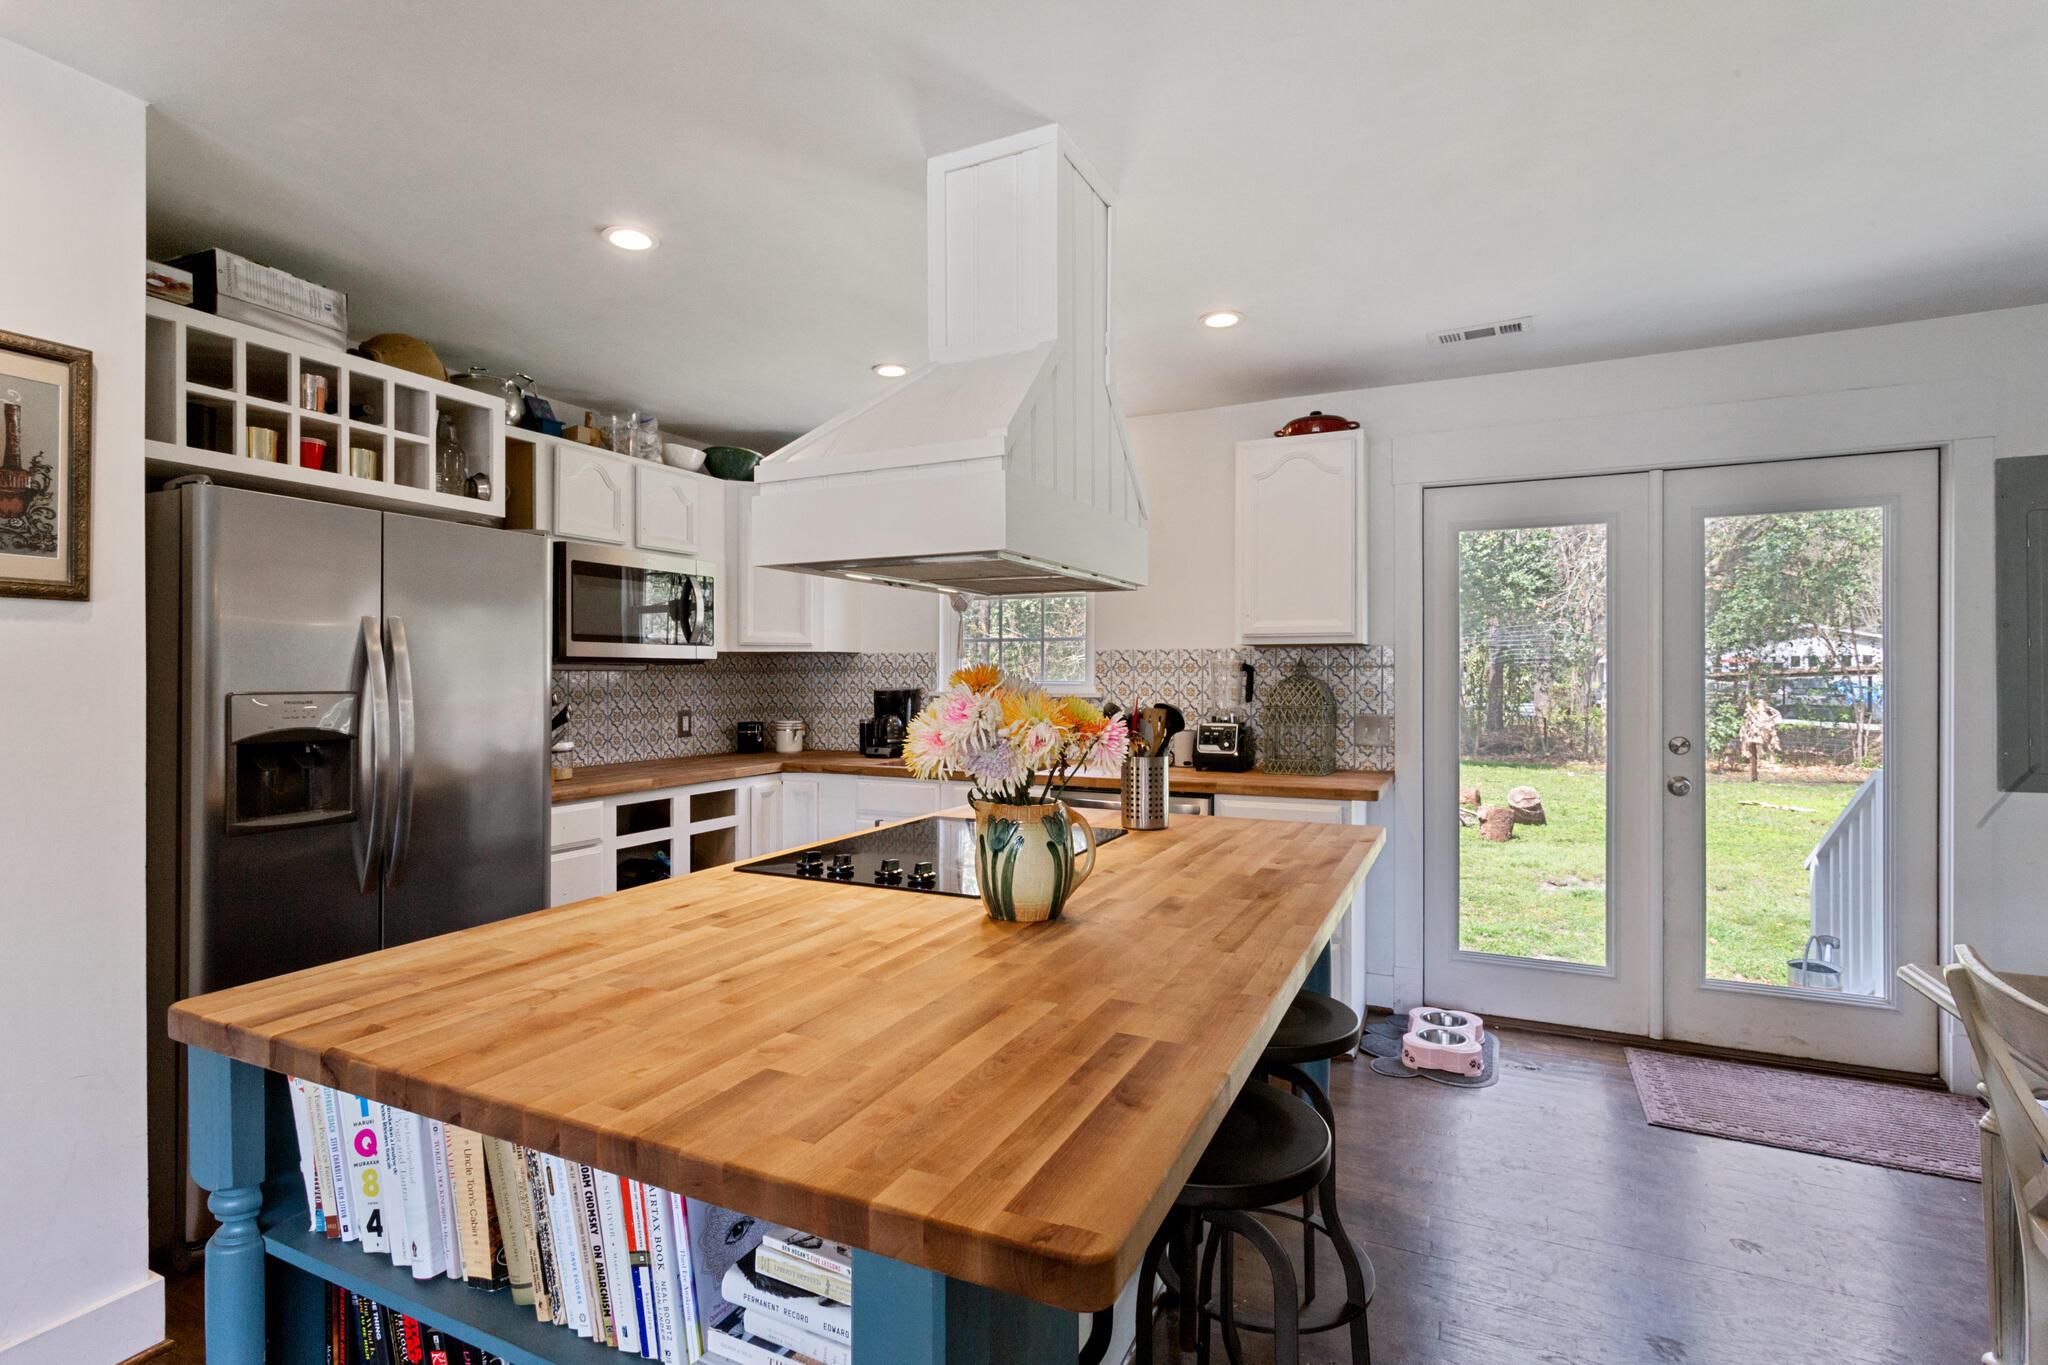 Stafford Heights Homes For Sale - 3472 Cynthia, Johns Island, SC - 4